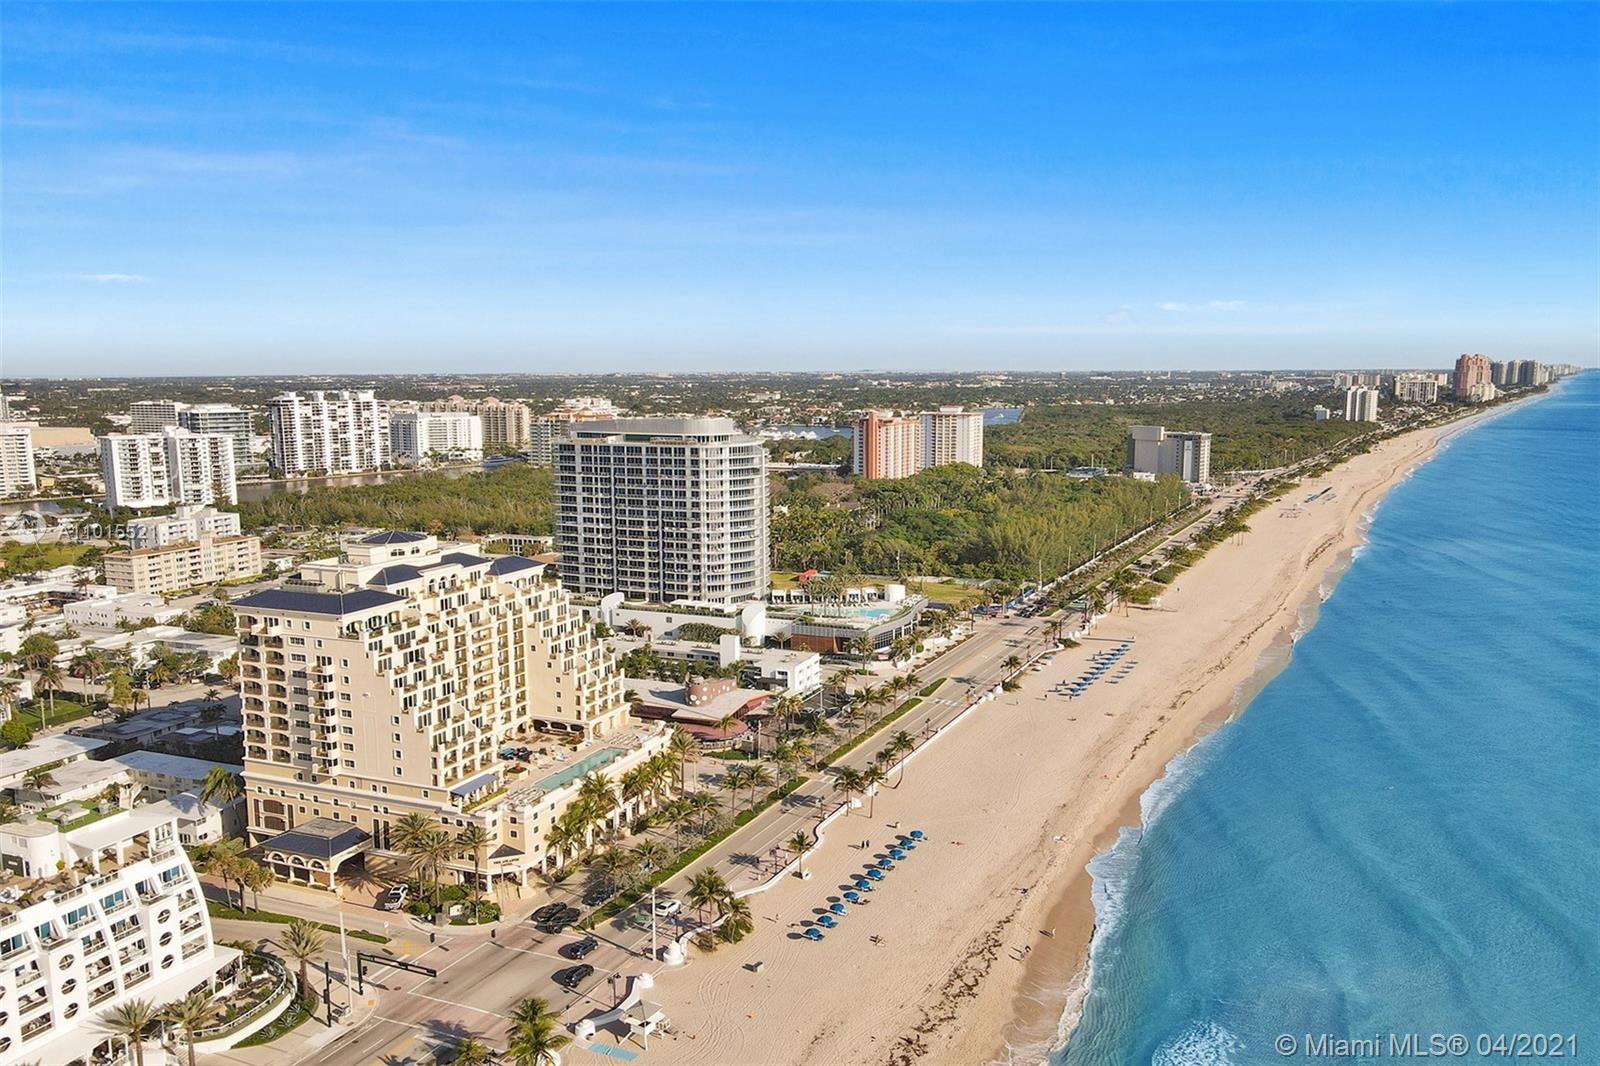 601 N Ft Lauderdale Beach Blvd #610, Fort Lauderdale, FL 33304 - #: A11015521